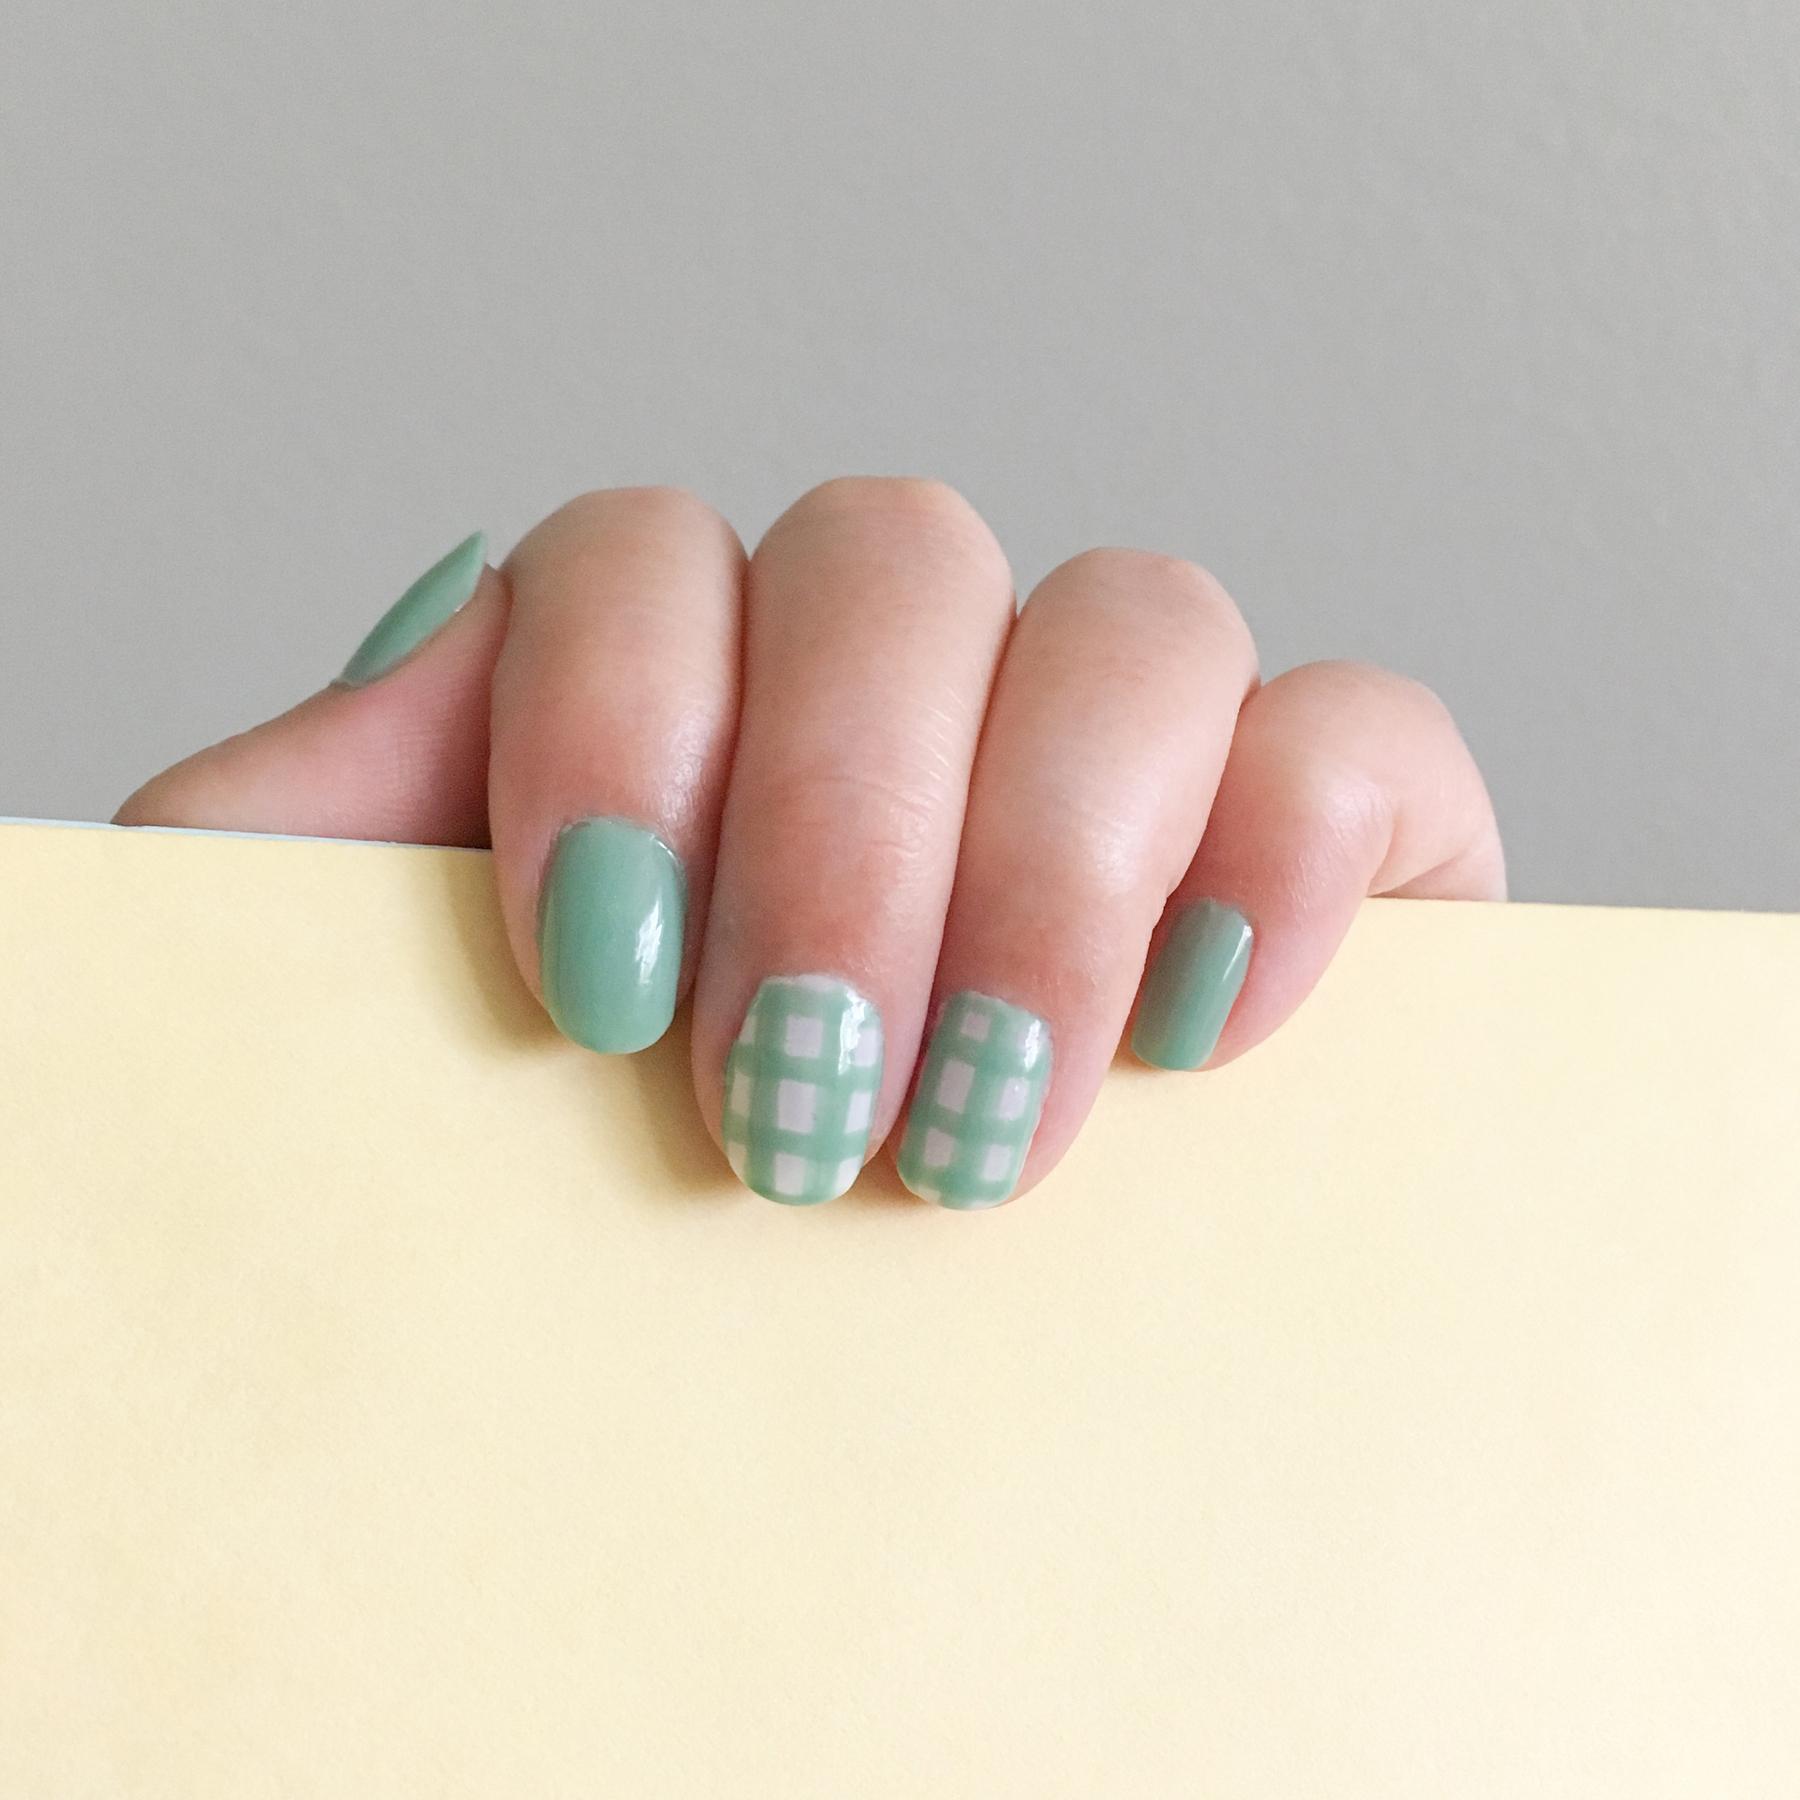 White: China Glaze 622 Moonlight / Green: Essie 752 Turquoise & Caicos